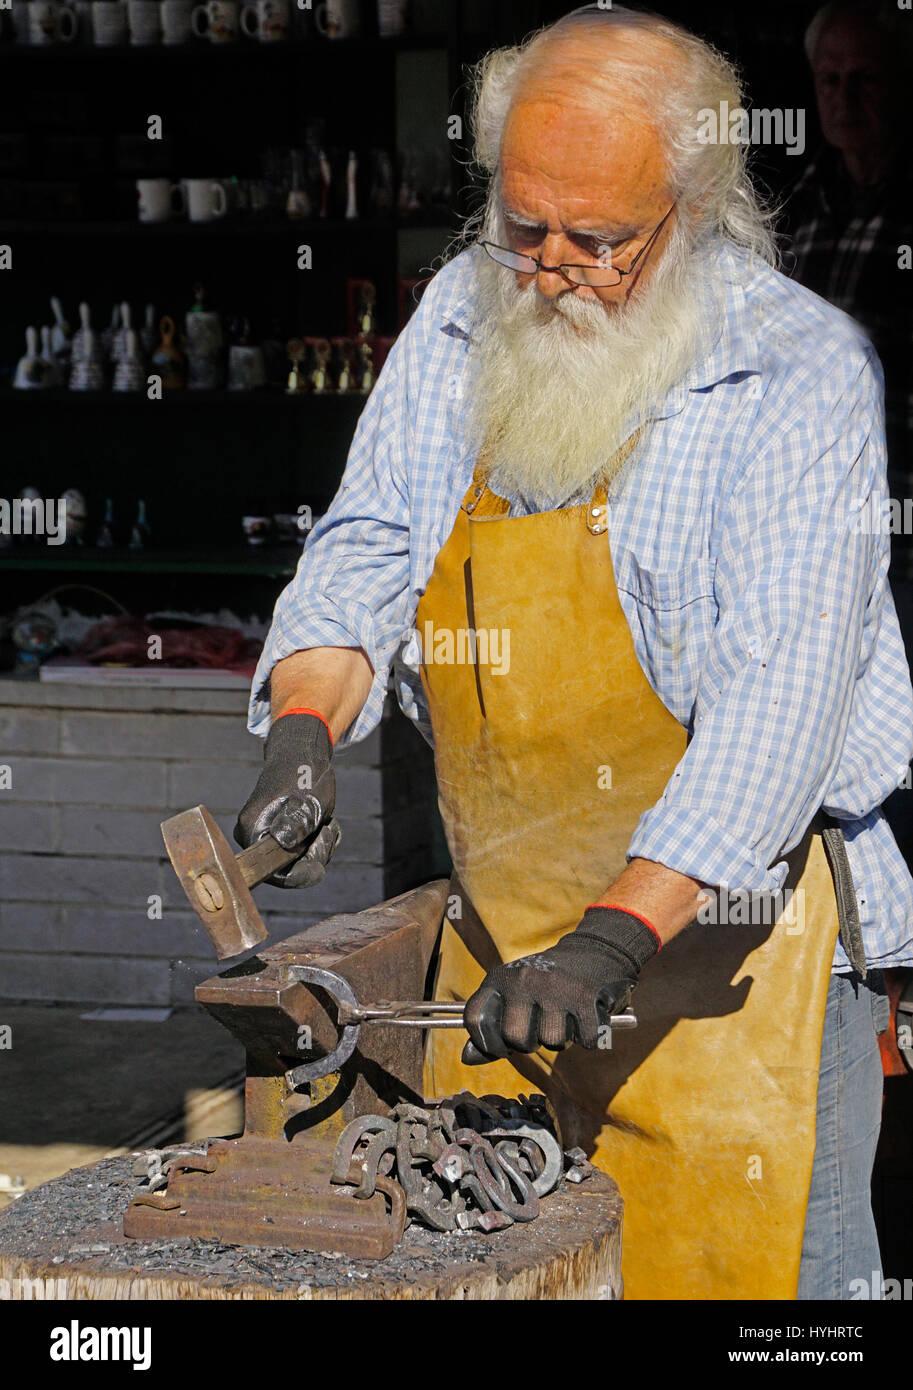 Blacksmith making horse shoes in Cetinje, Montenegro. - Stock Image